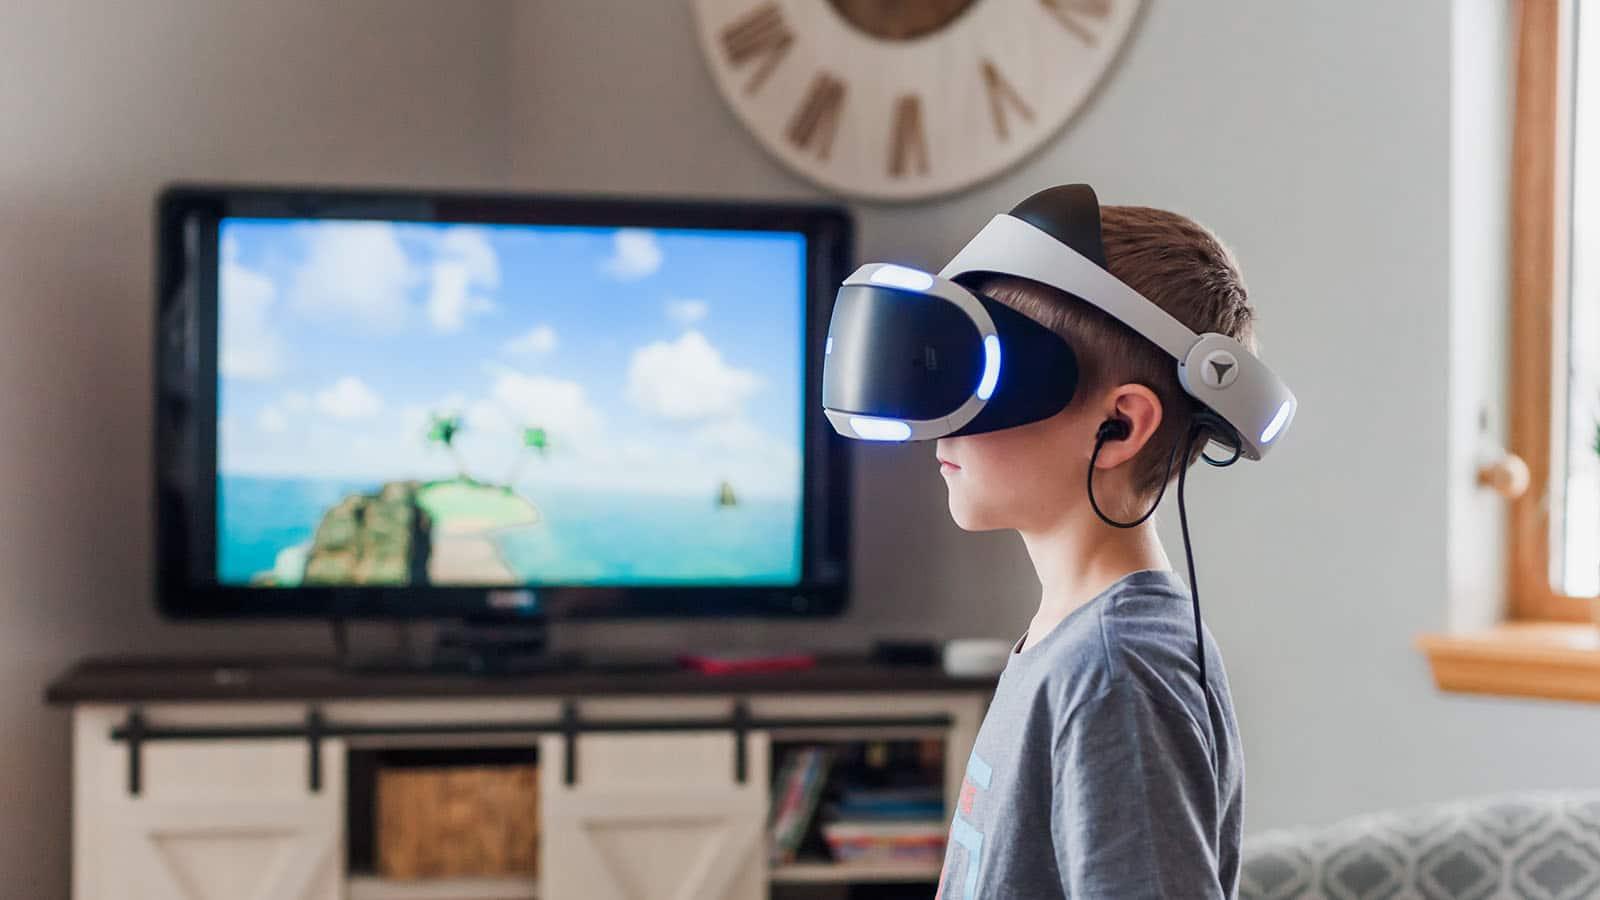 Virtuelle-realität-saint-jean-de-monts